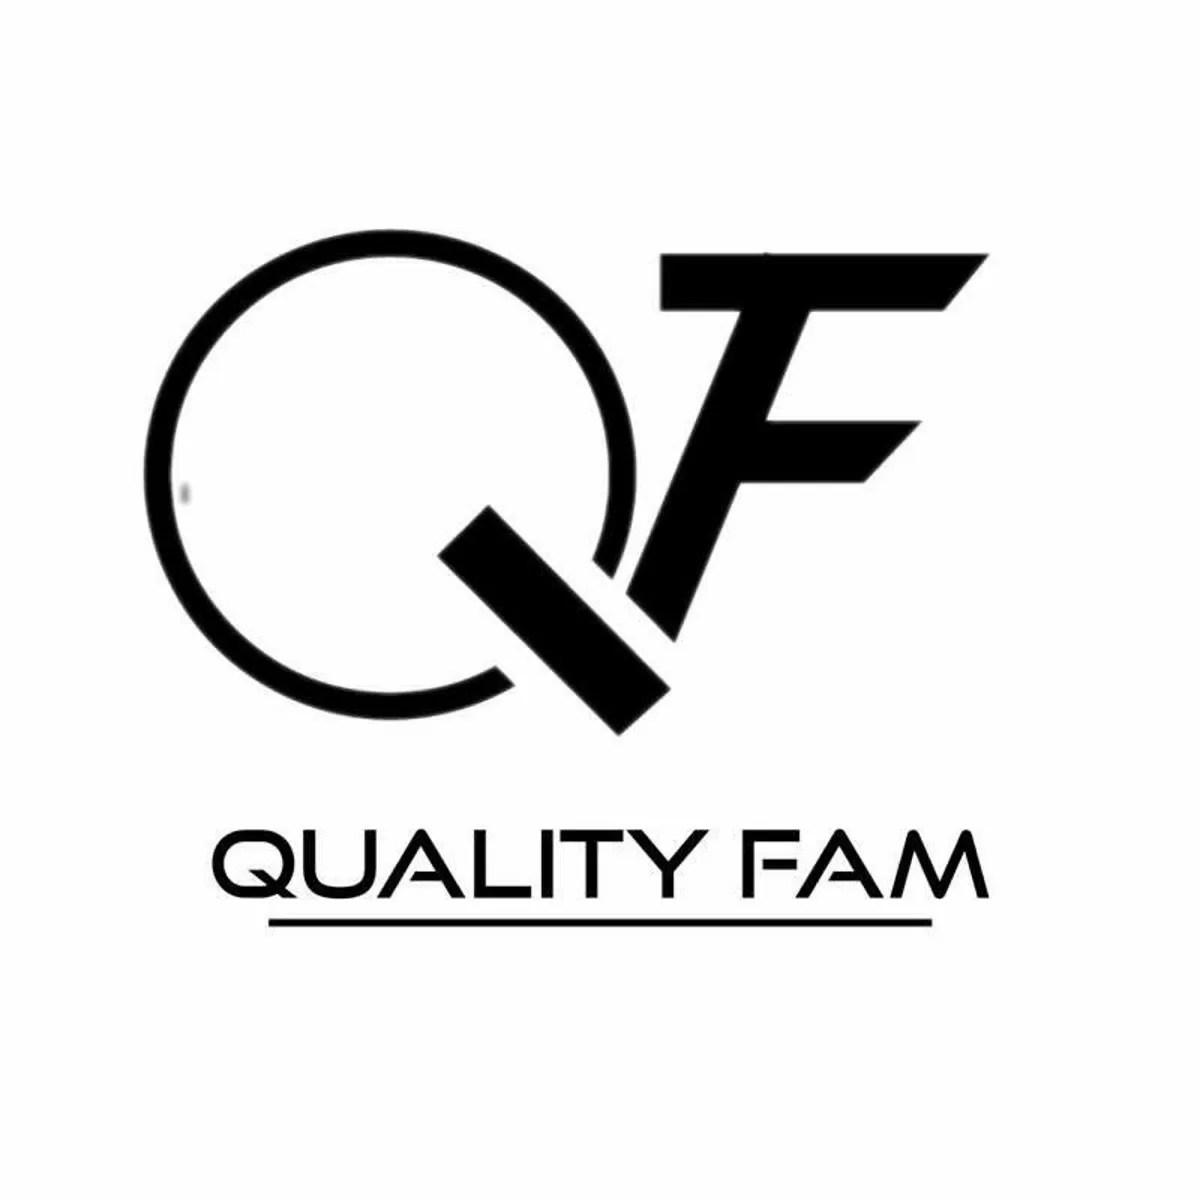 Quality Fam & Teddy'Bae - R.I.P SIMO (Heart Broken)